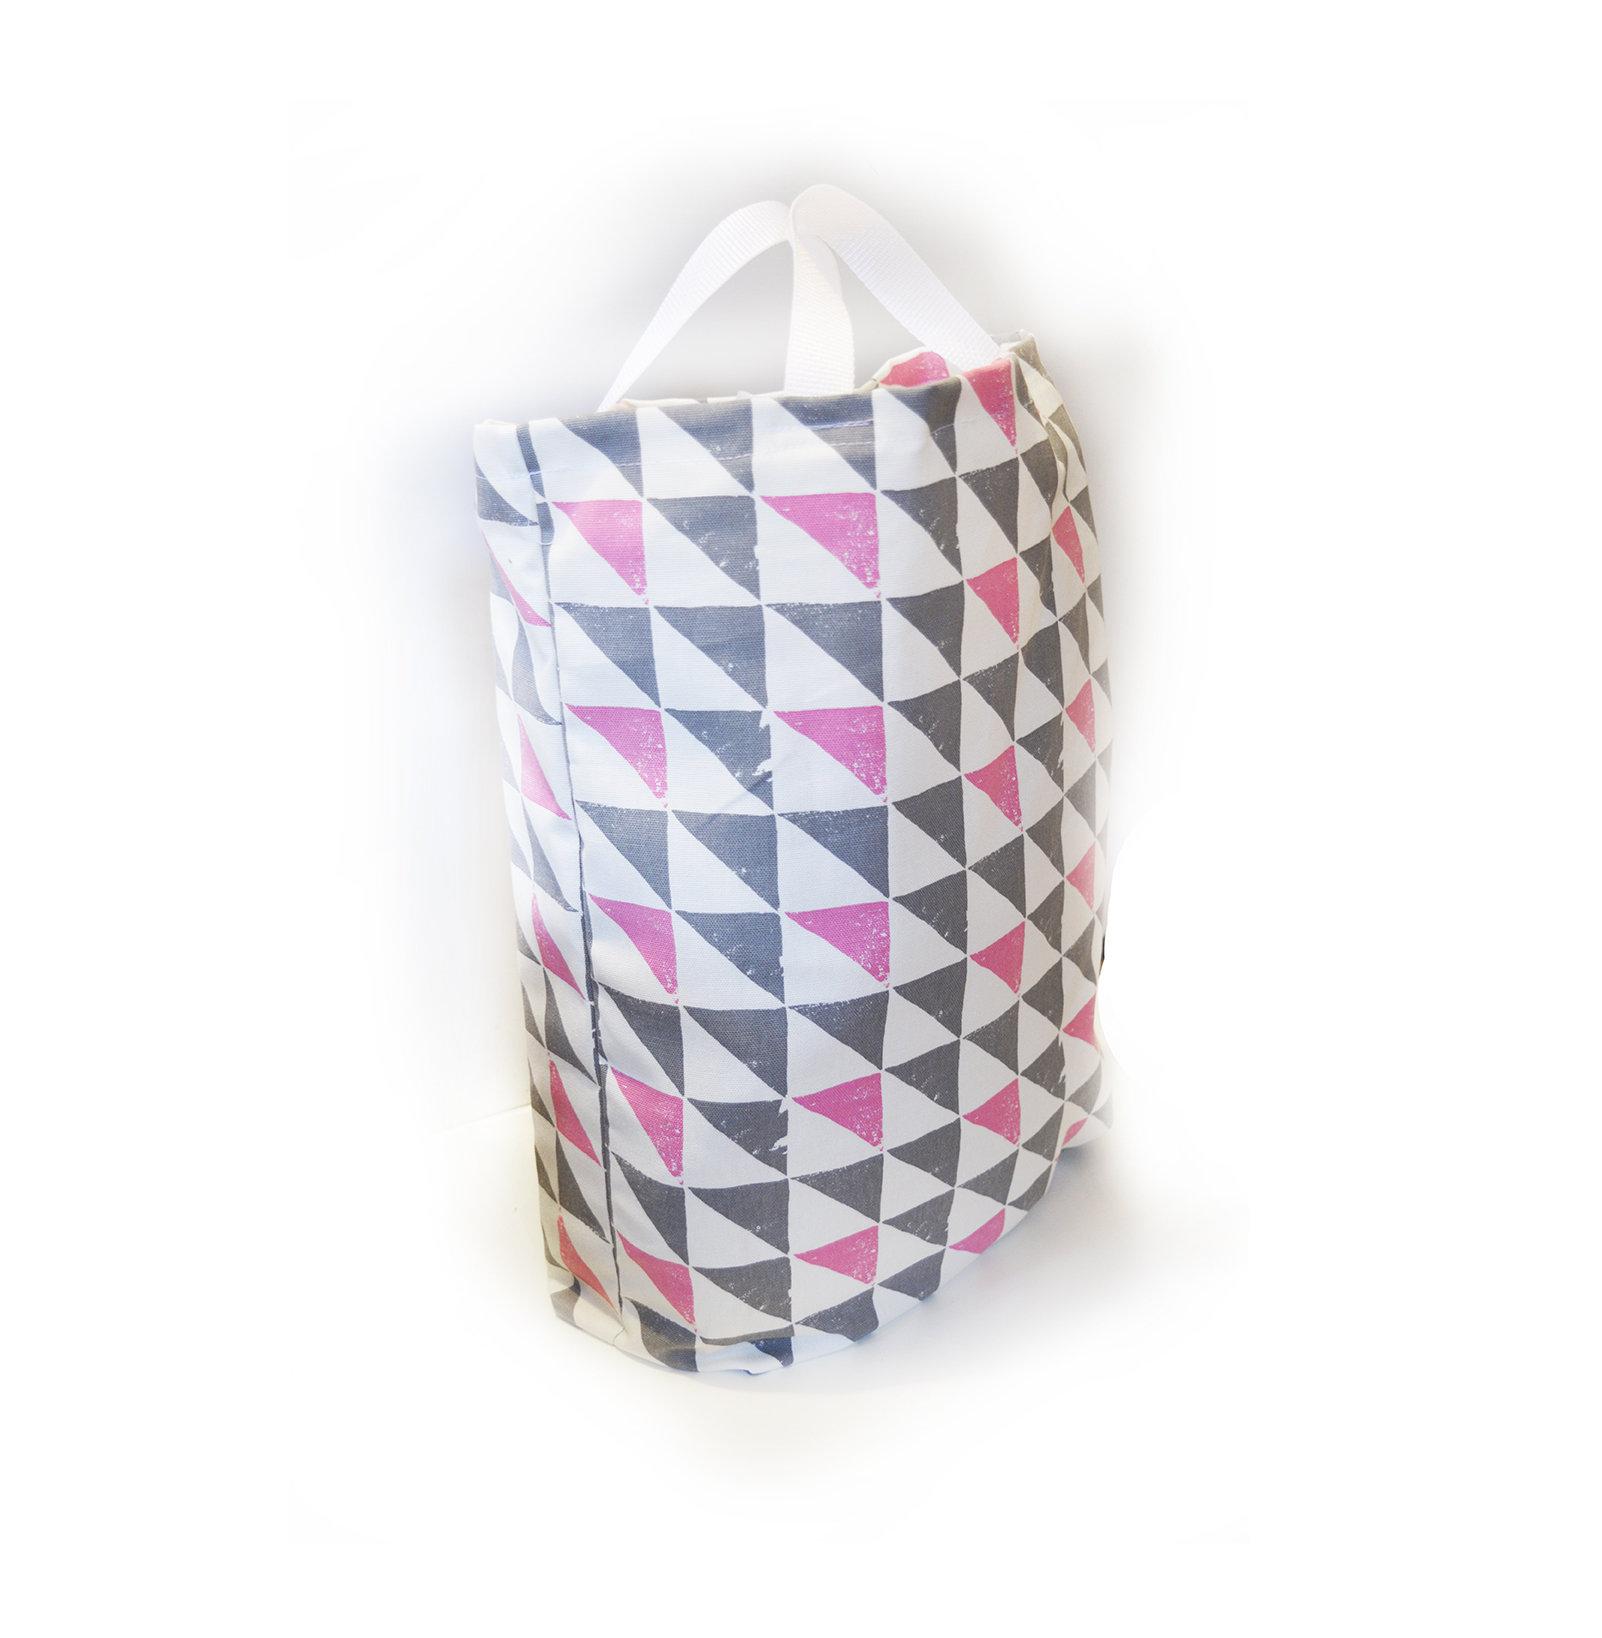 Simply Good™ Reusable Grocery Tote Bag 00407